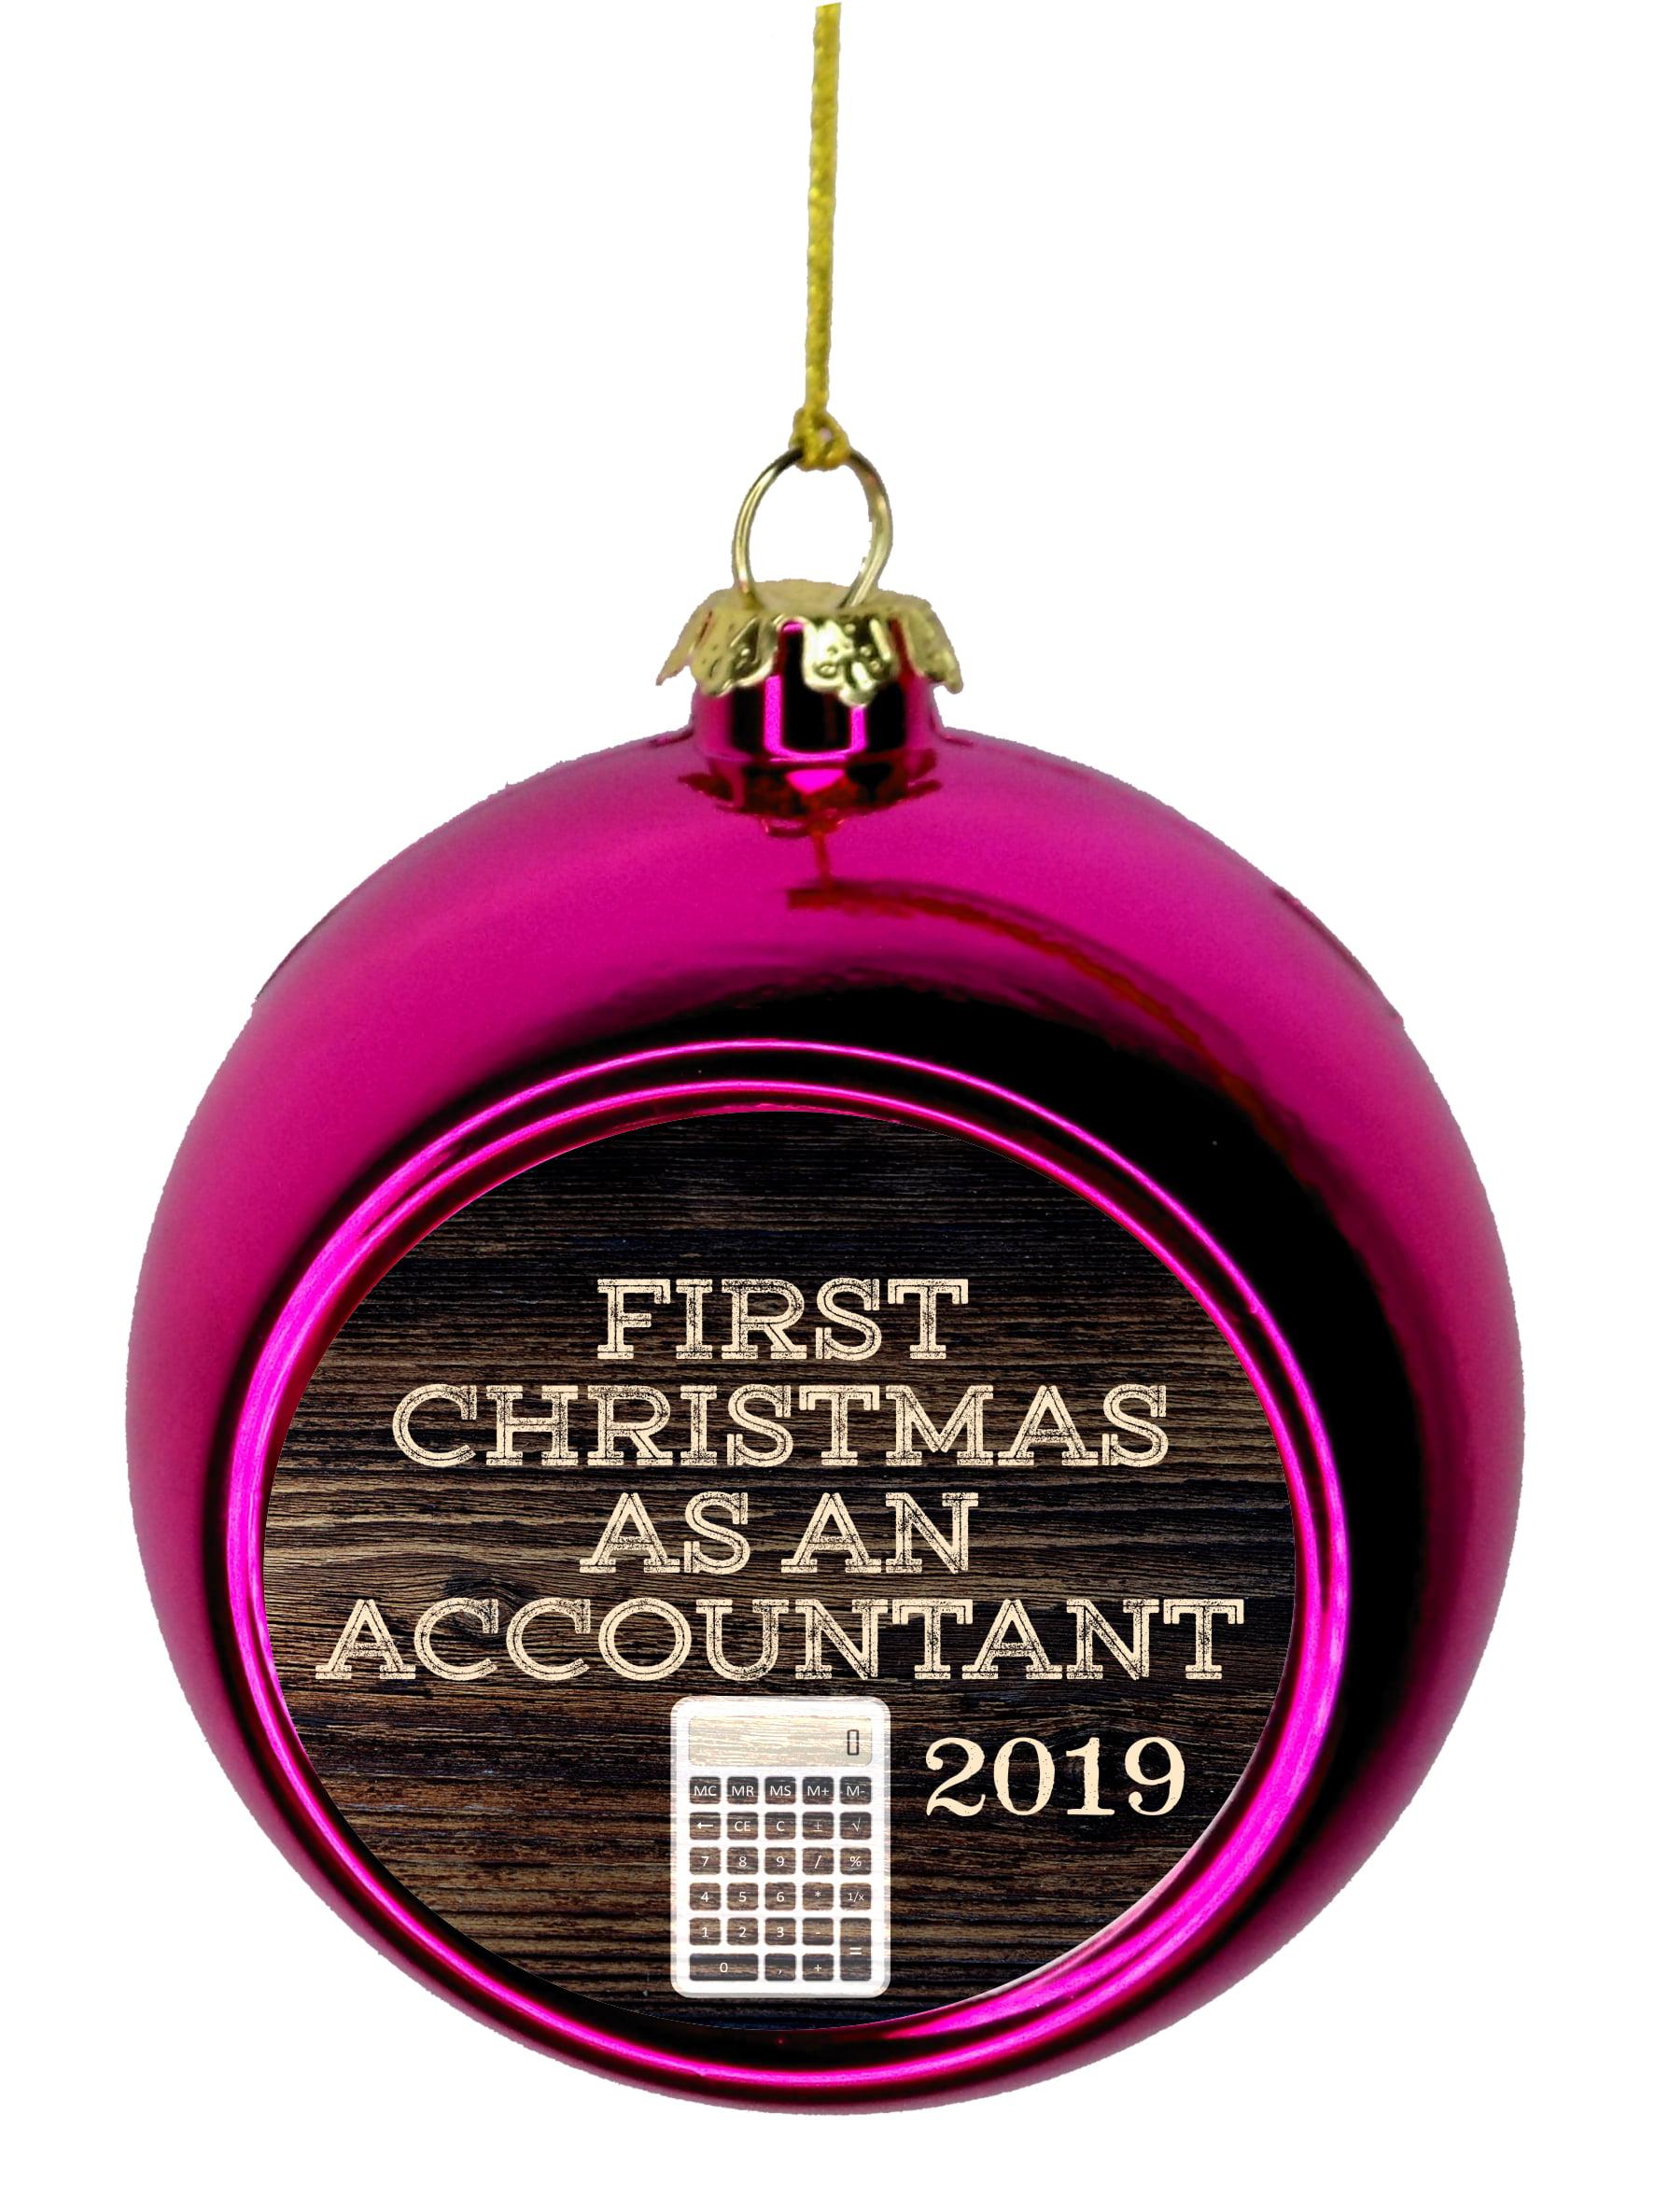 Christmas Accountant.First Christmas As An Accountant 2019 Career Job Gift Appreciation 1st Ornaments Bauble Christmas Ornaments Pink Bauble Tree Xmas Balls